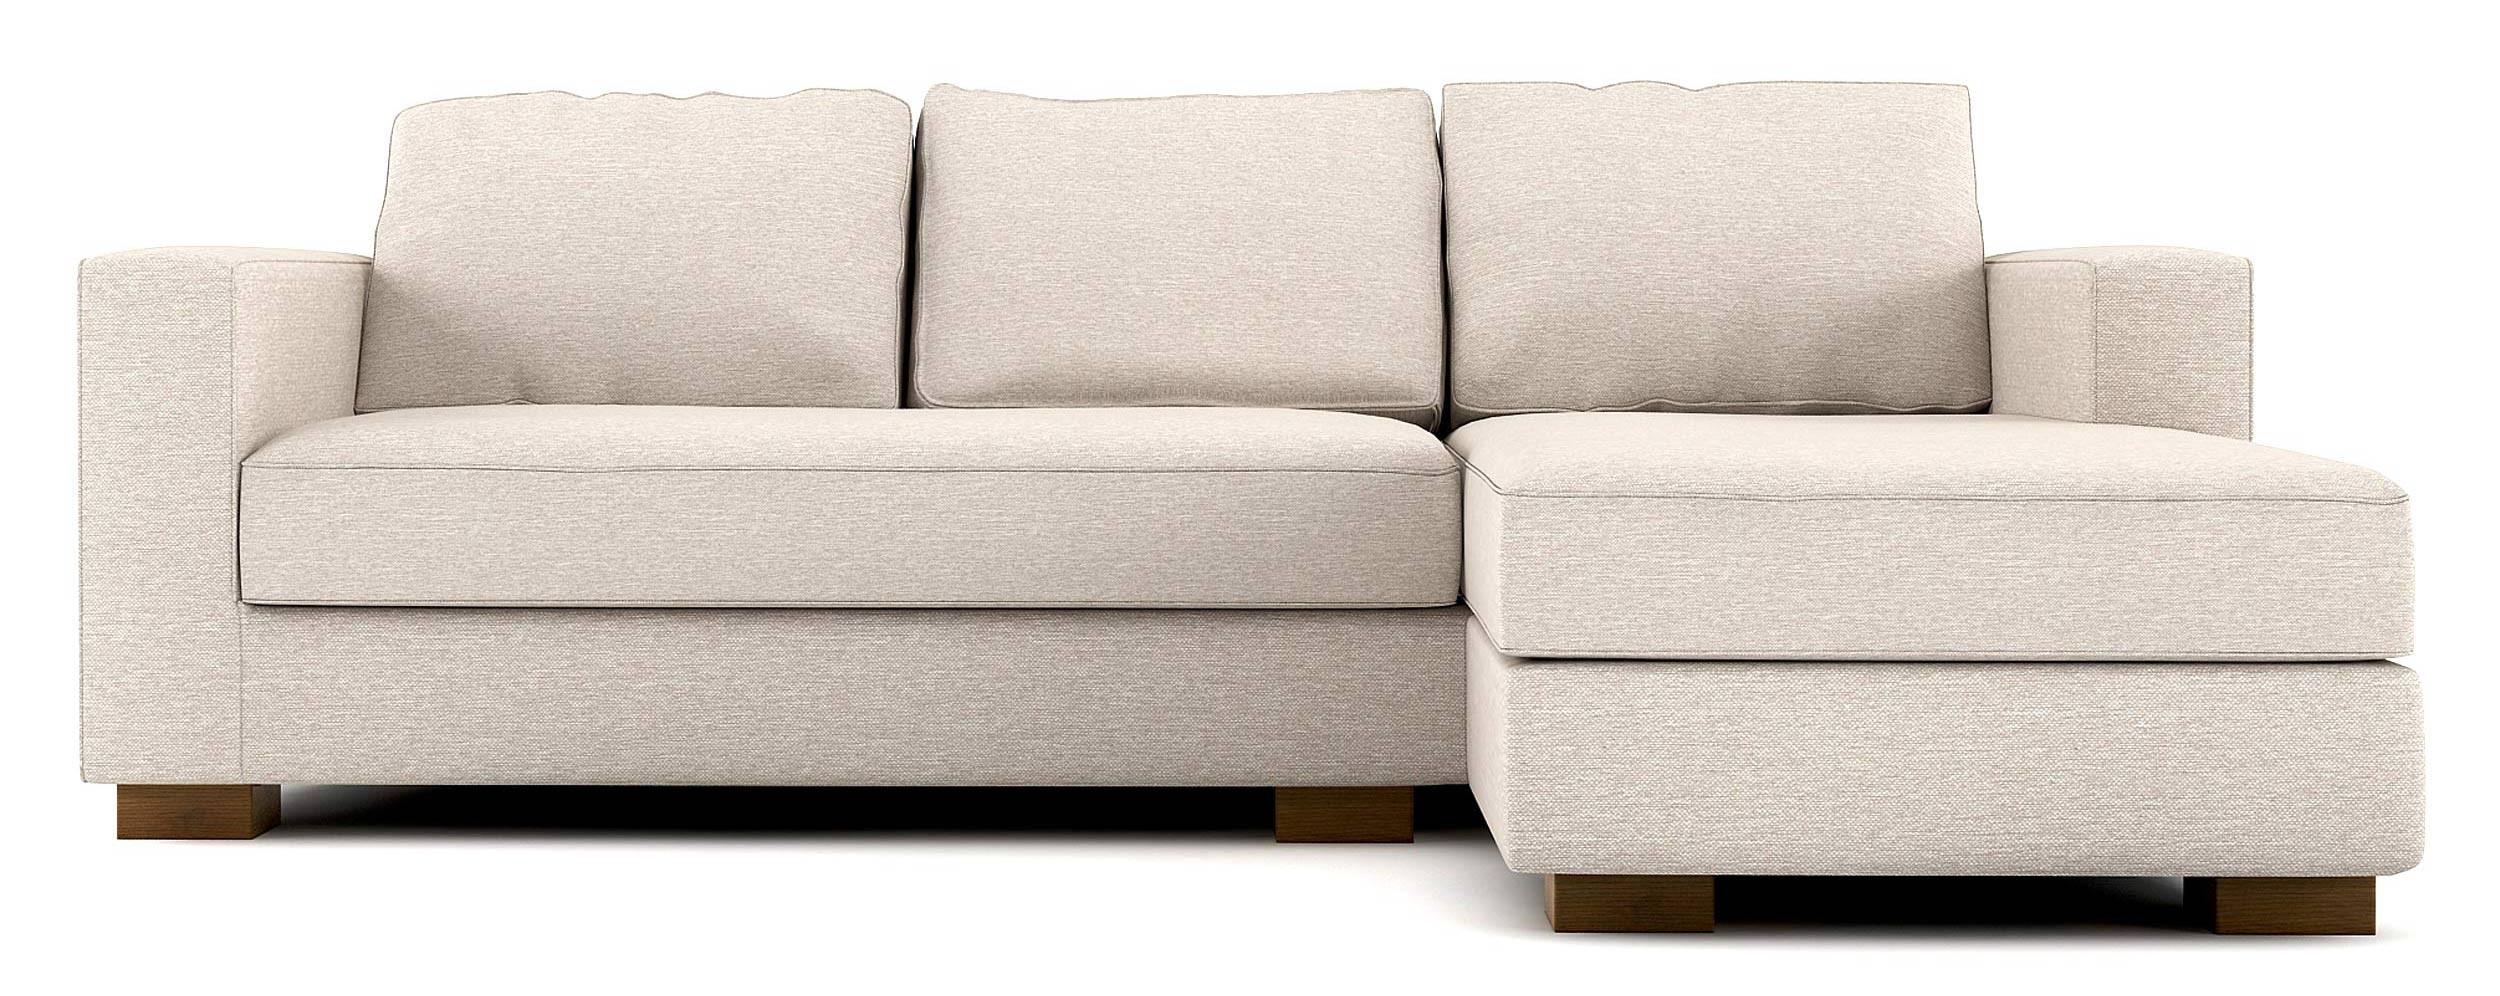 custom sectional sofa rio apartment chaise sectional ... CIFHHVB